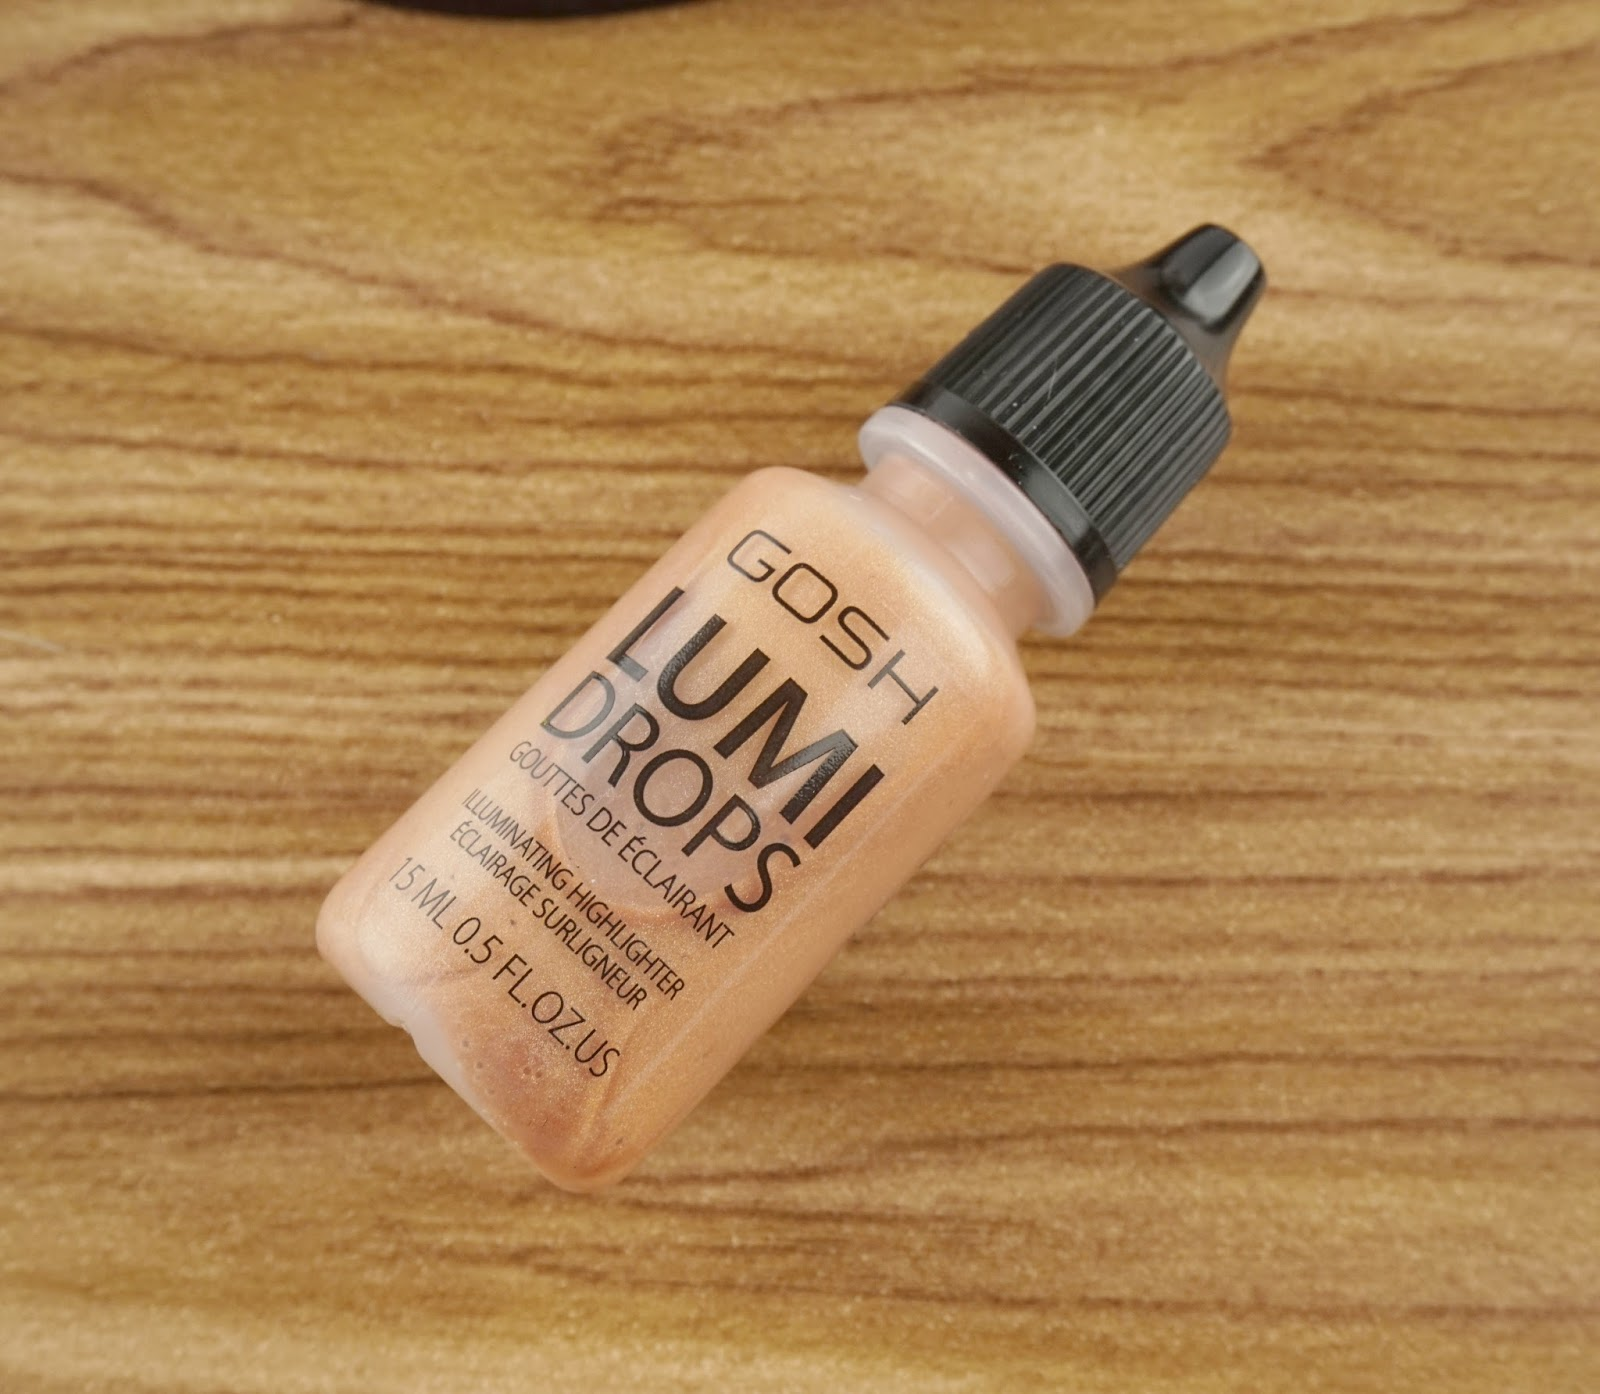 GOSH Cosmetics core products review lumi drops  peach